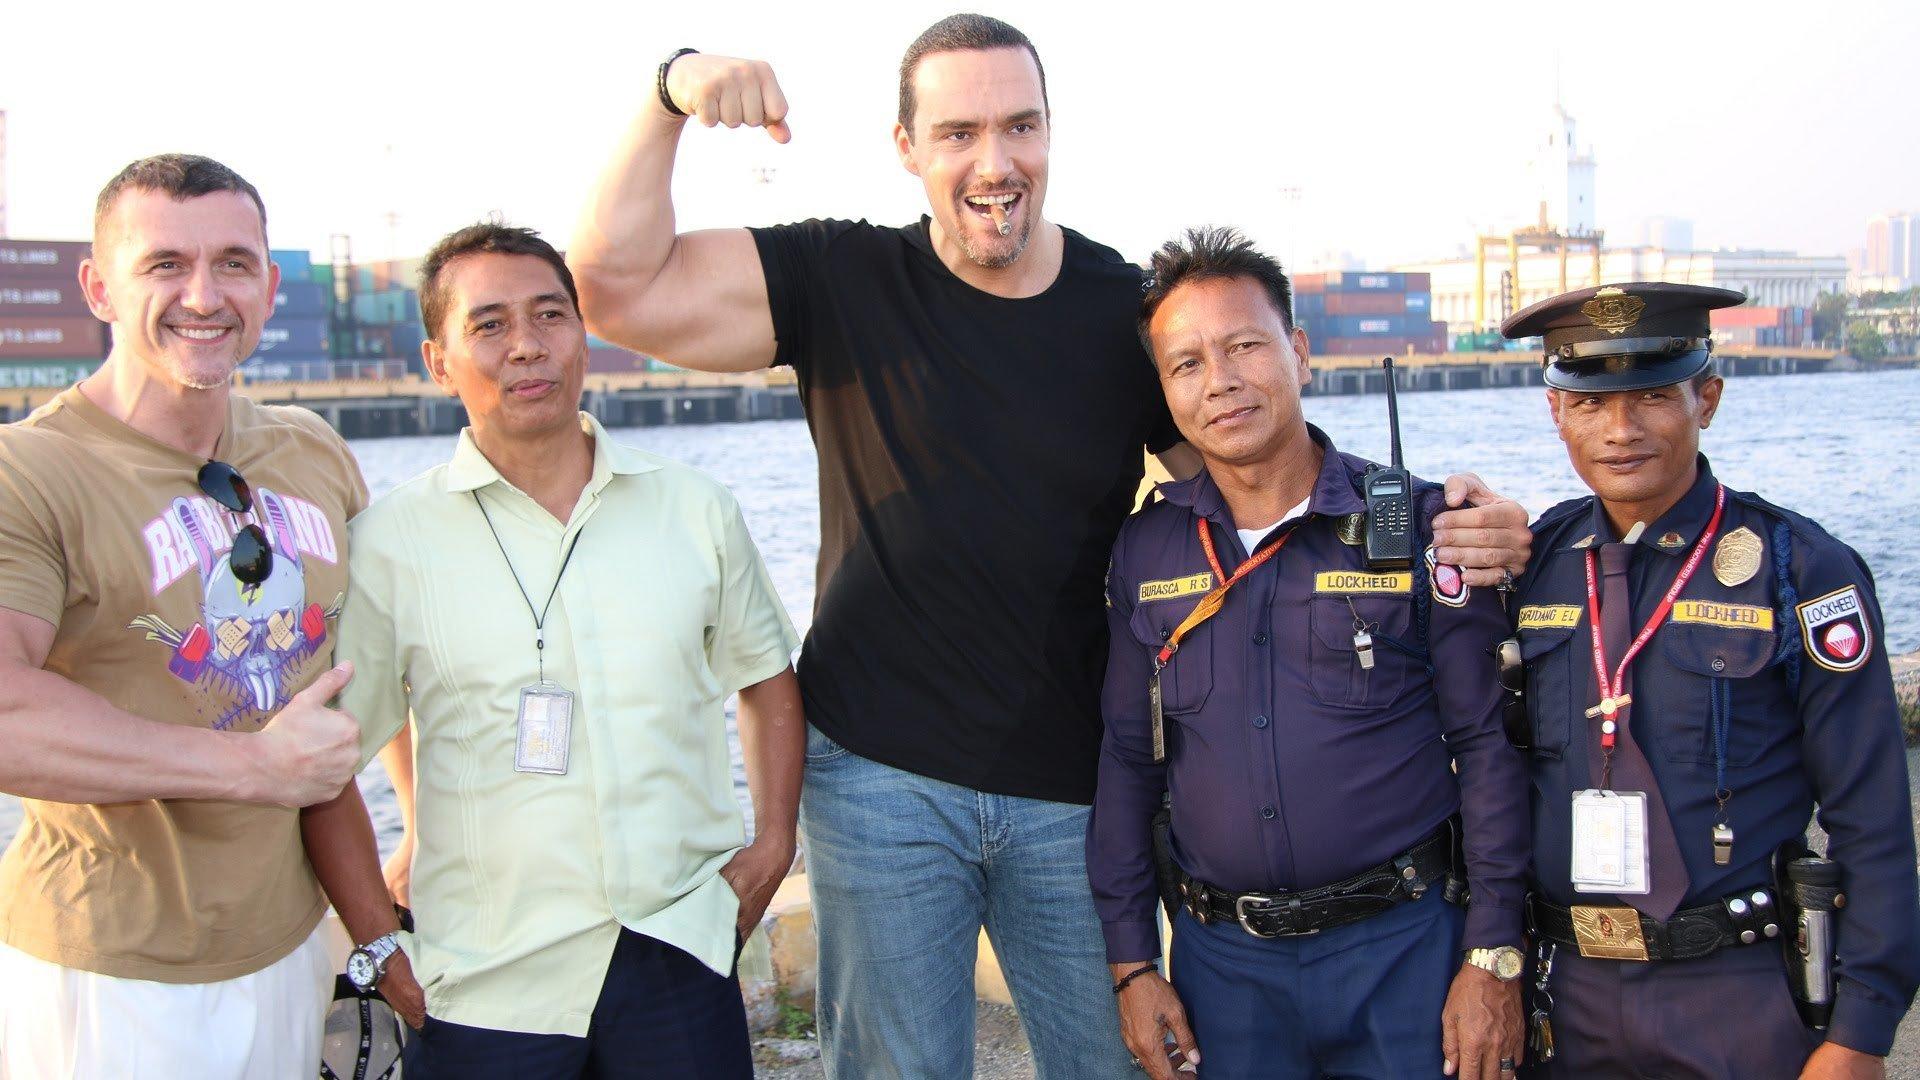 Разборка в Маниле смотреть фото